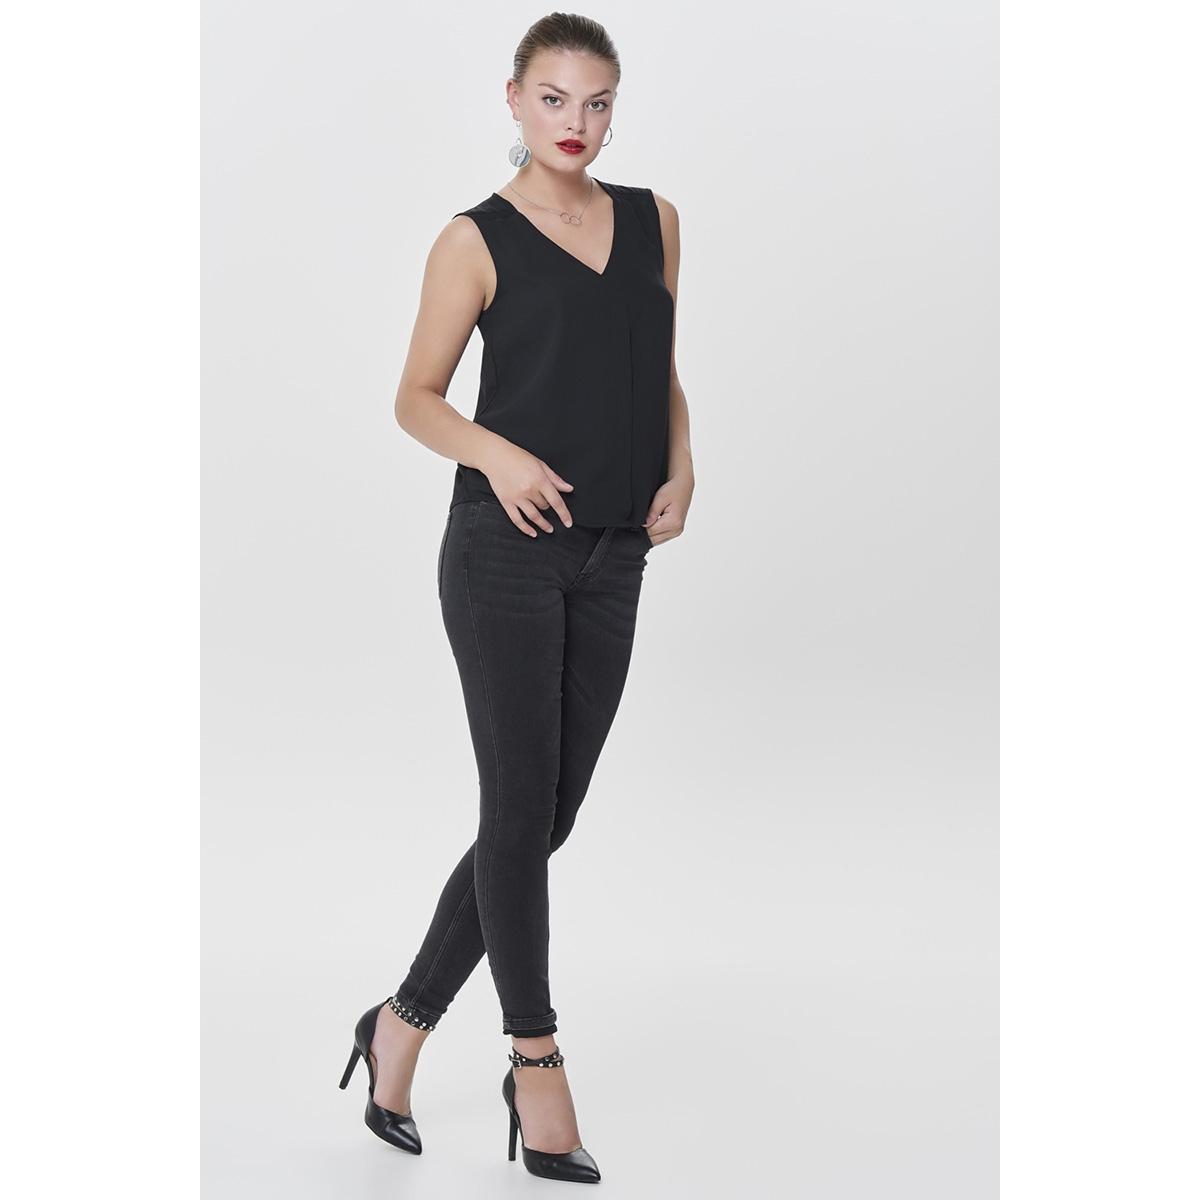 jdyjake skinny rw black dnm noos 15161188 jacqueline de yong jeans black denim